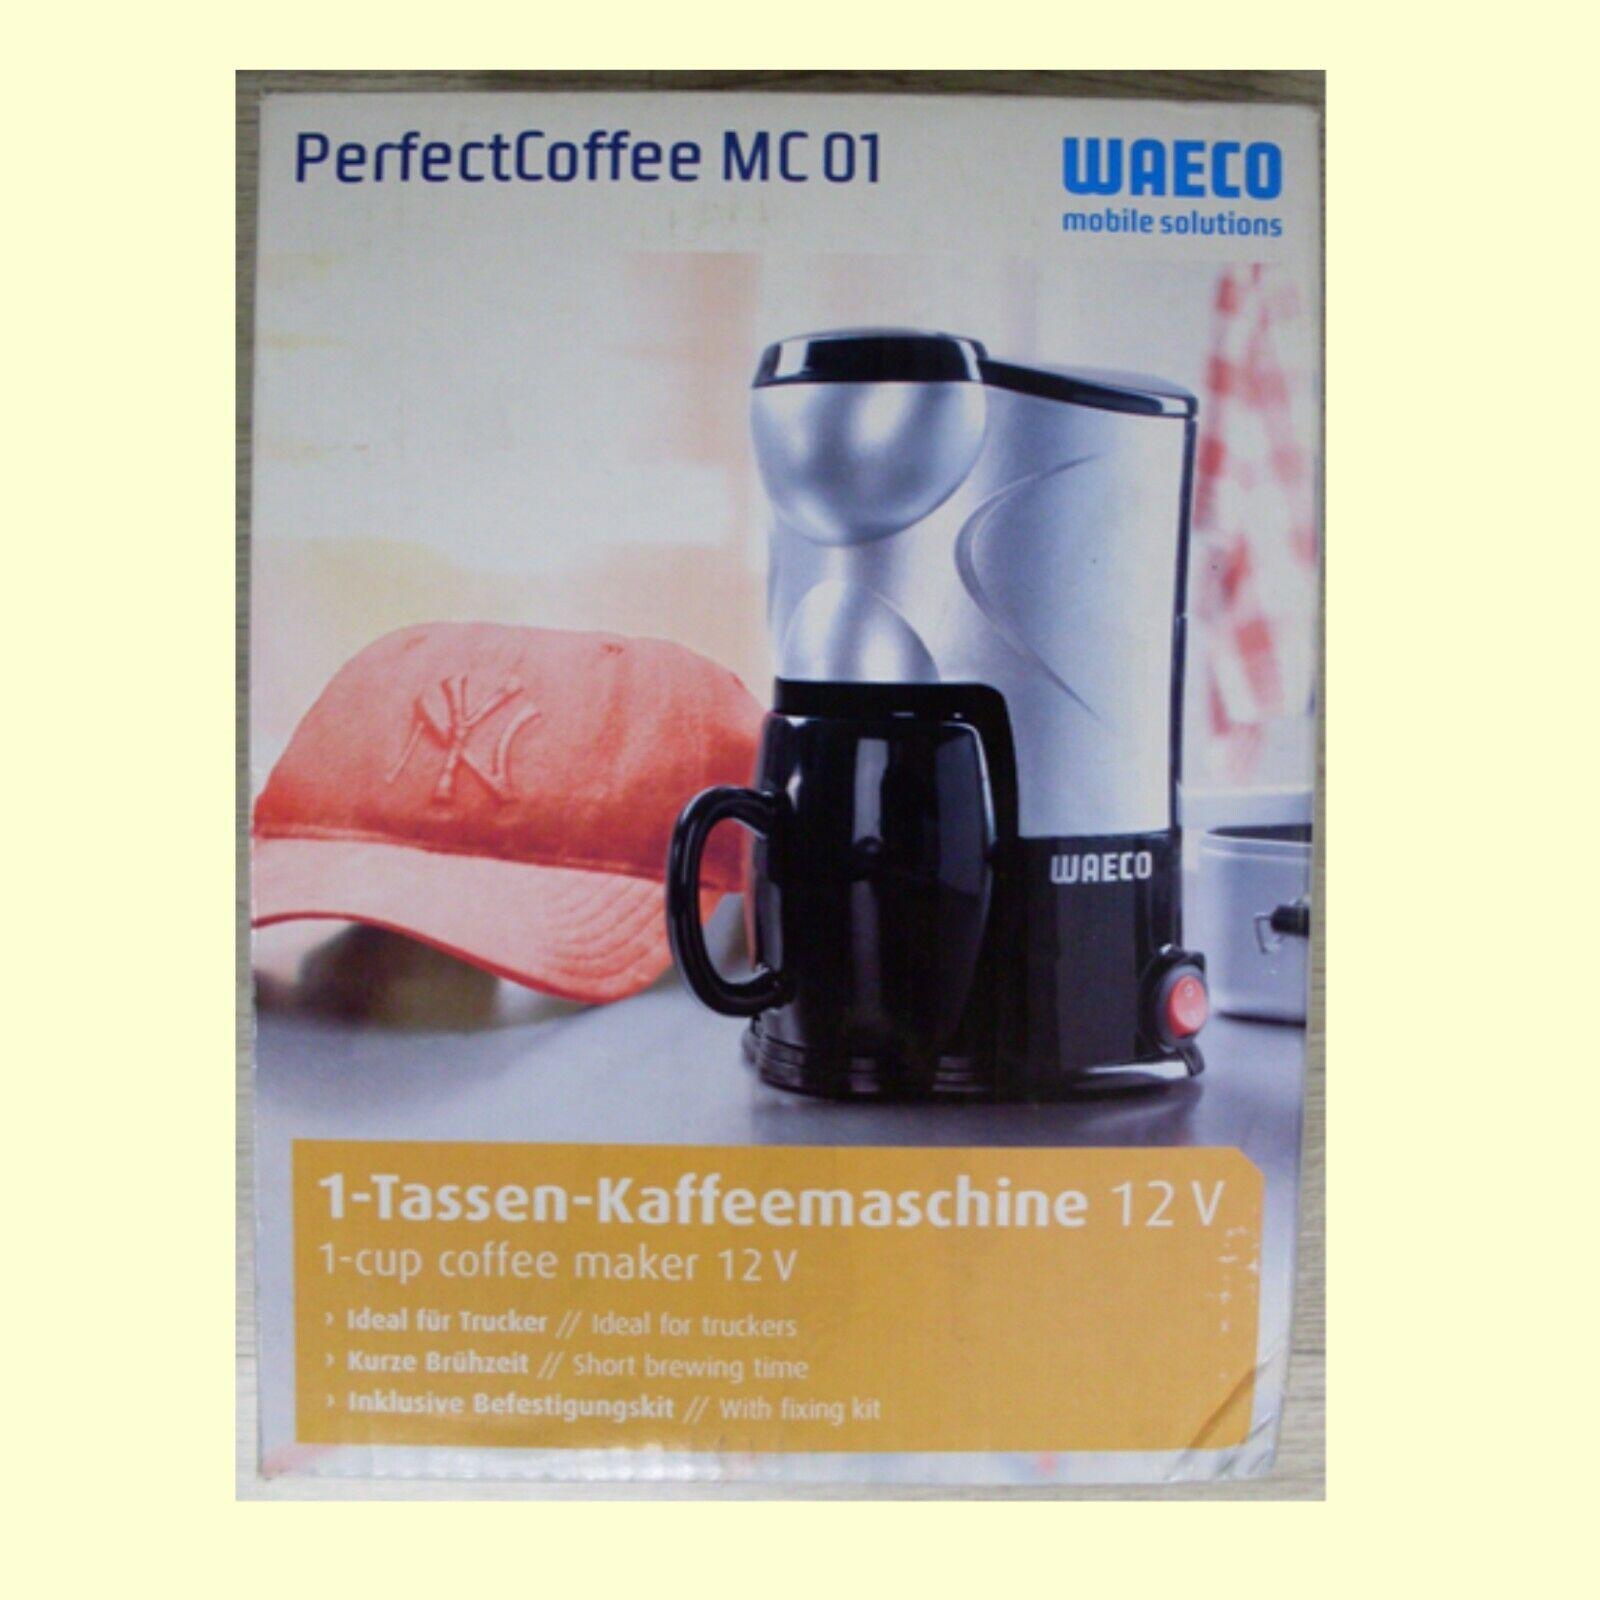 12V 12 Volt WAECO 1 Tassen Kaffeemaschine MC-01-12 PerfectCoffee Pkw